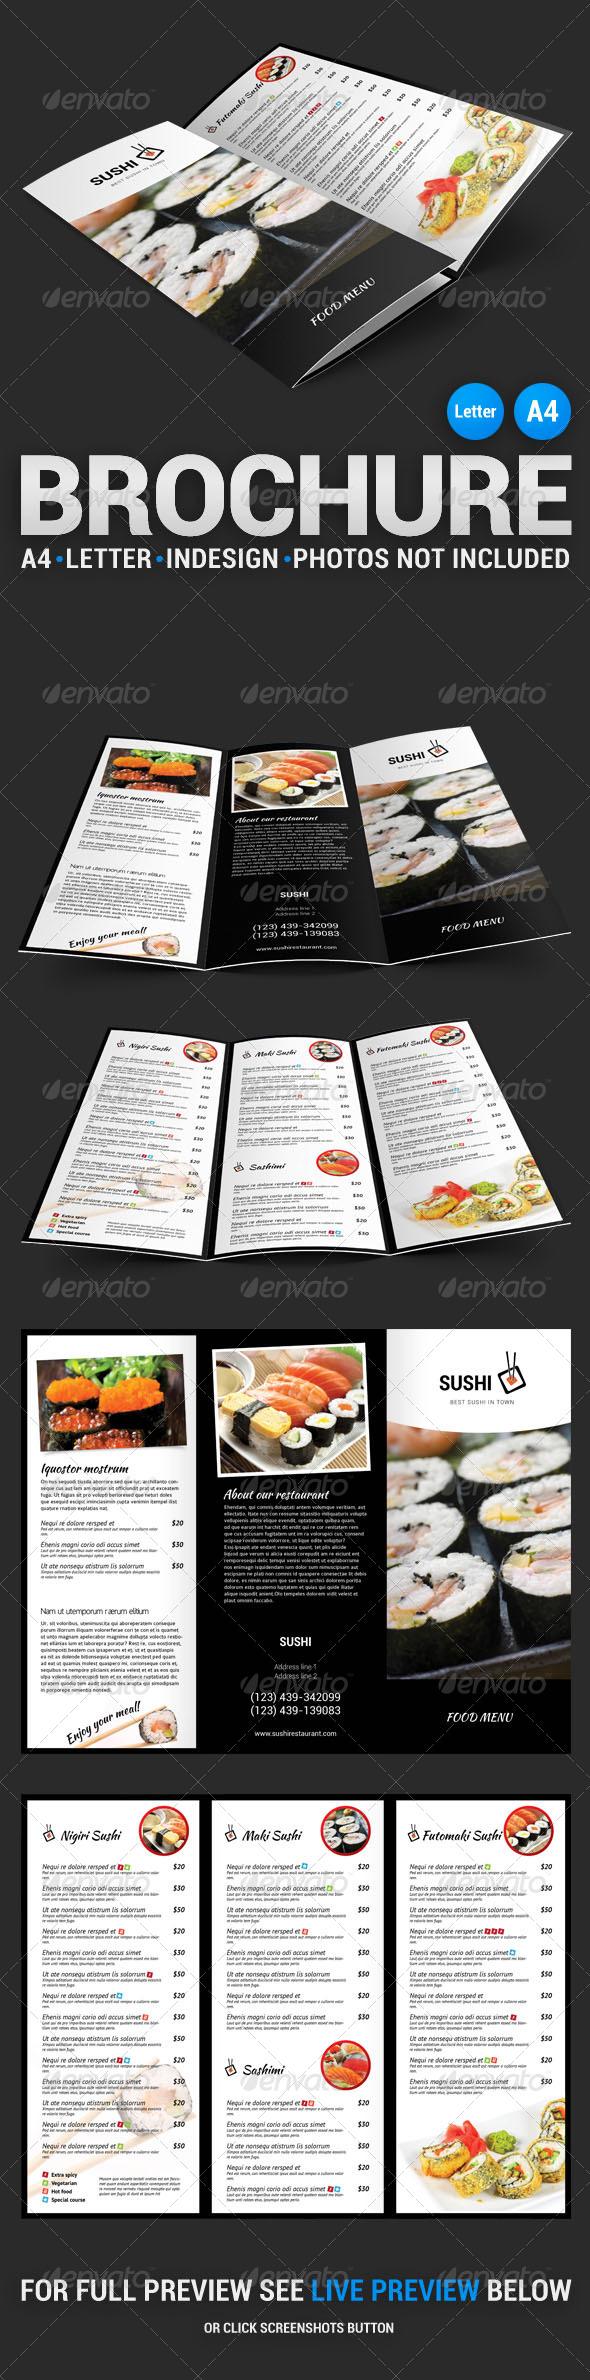 Sushi Menu Tri-Fold Brochure - Food Menus Print Templates